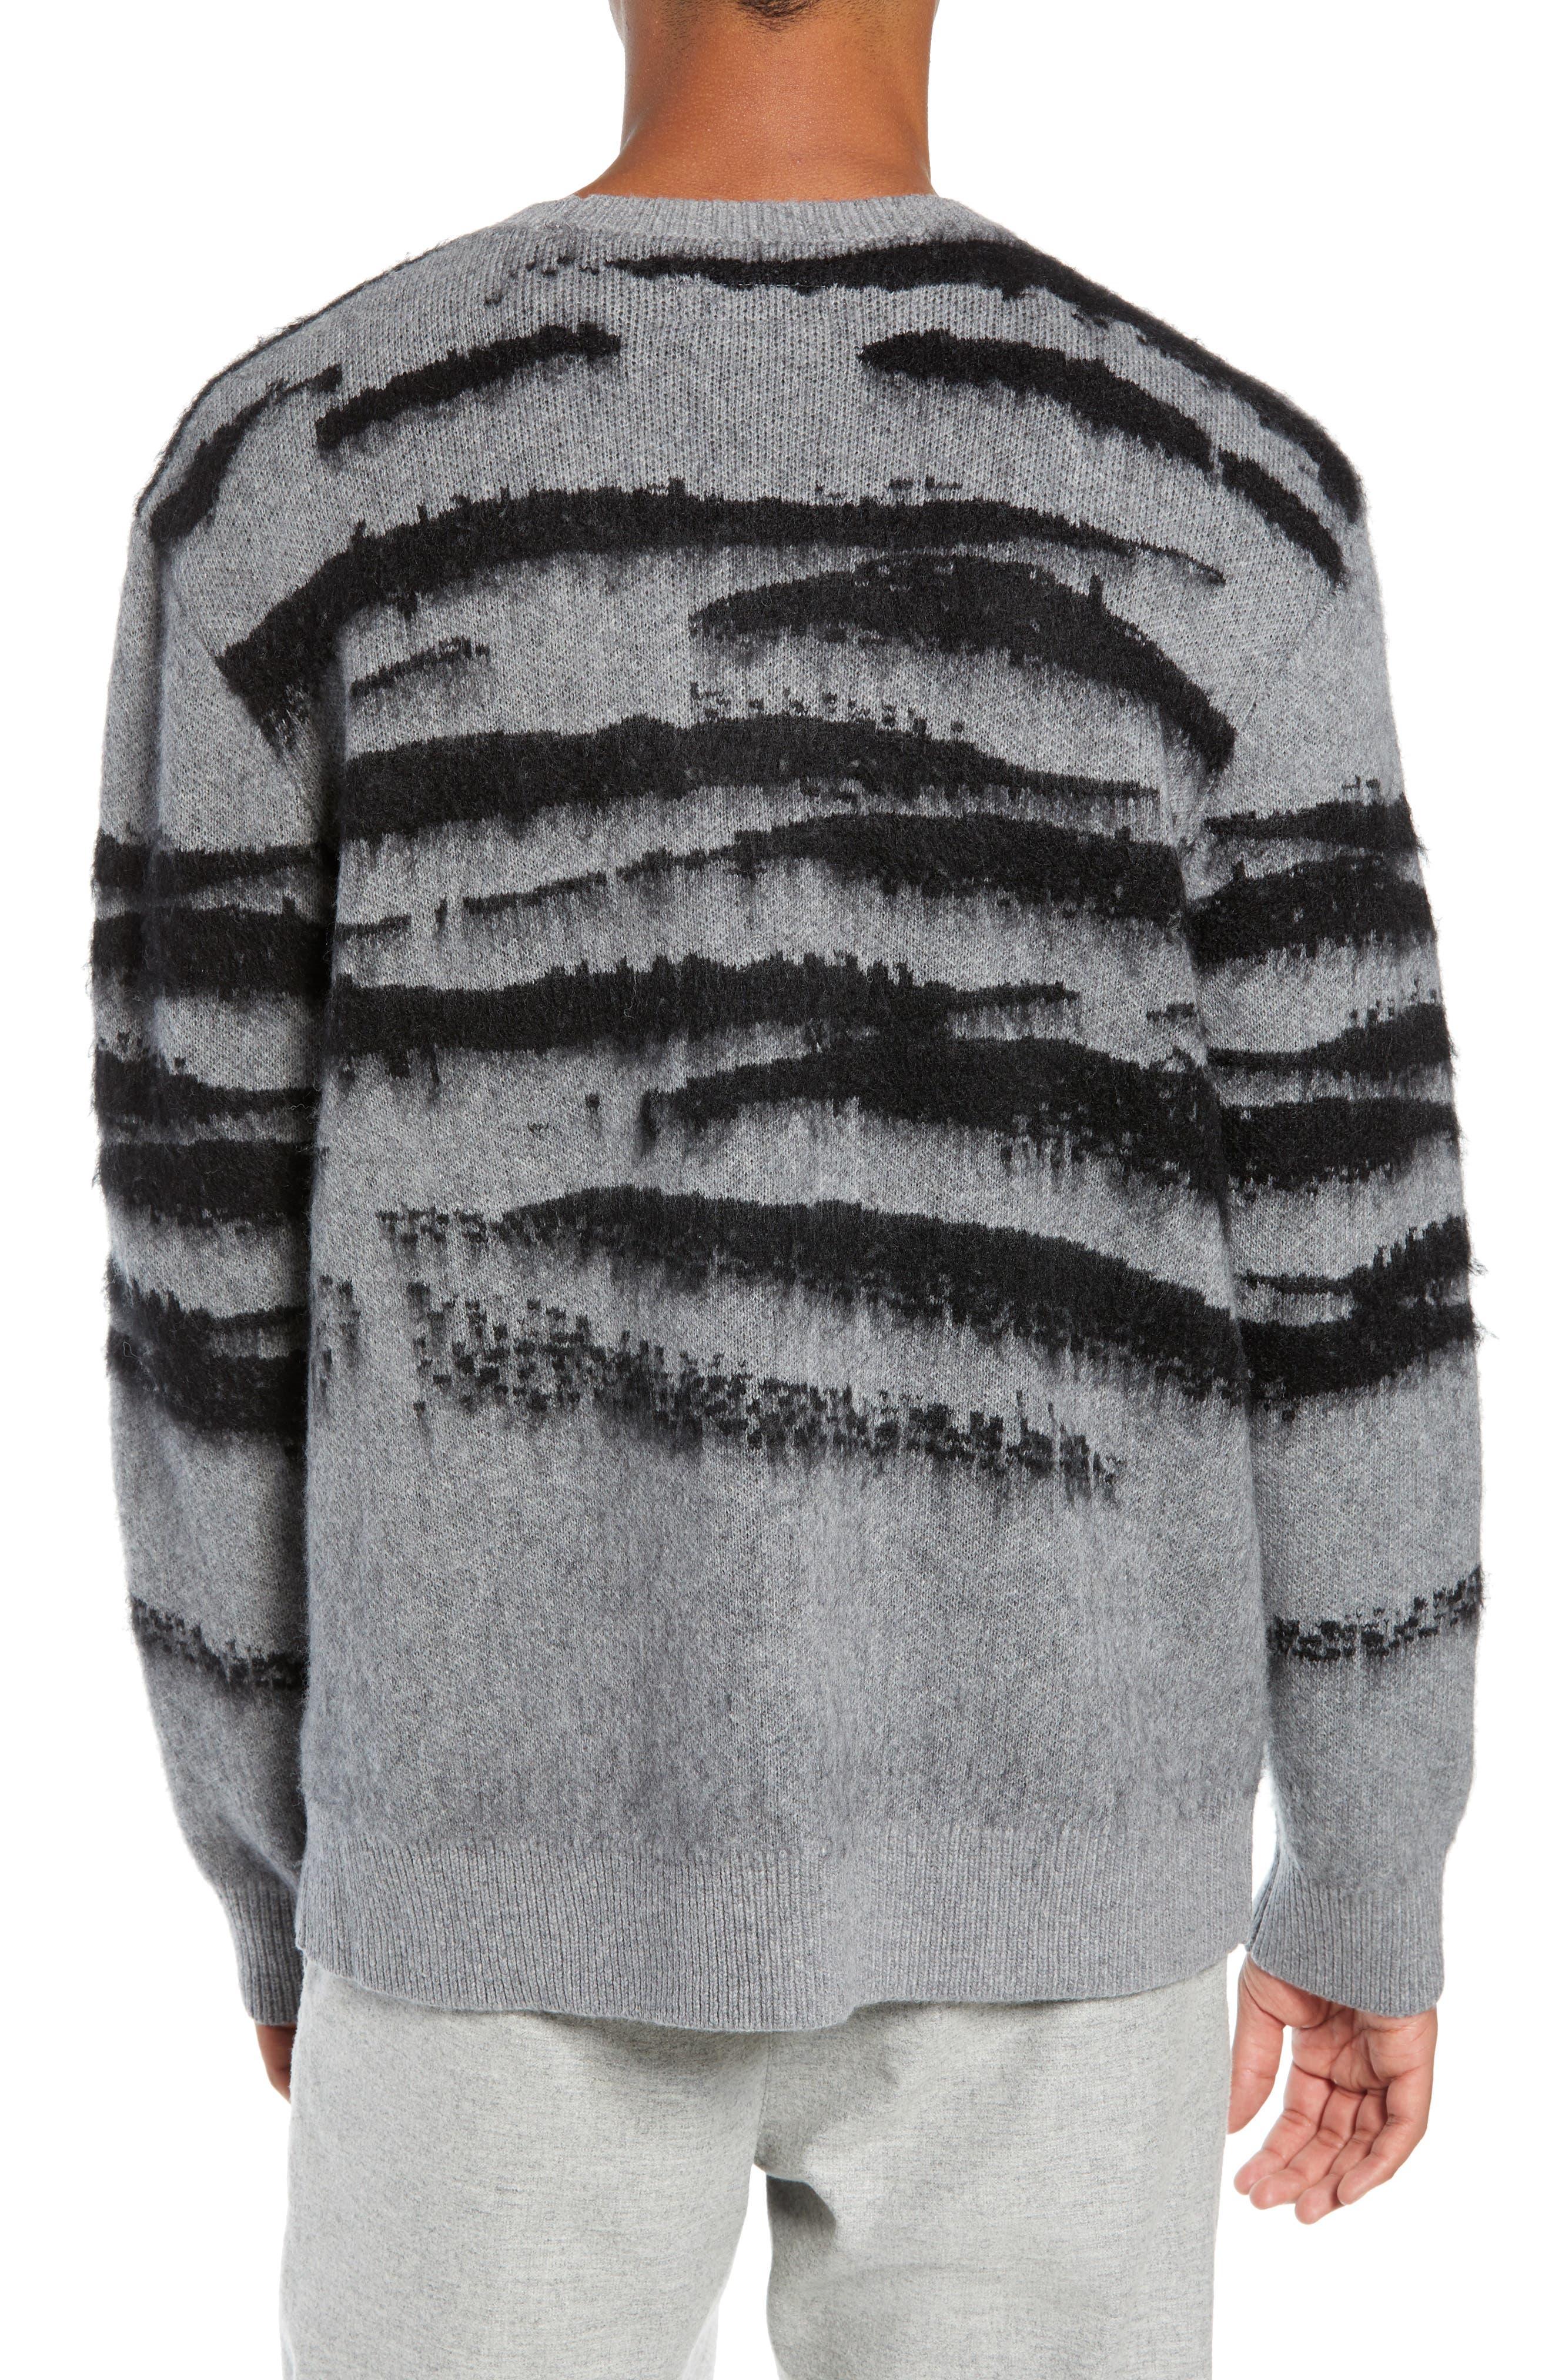 Ture Regular Fit Sweater,                             Alternate thumbnail 2, color,                             GREY/ CINDER